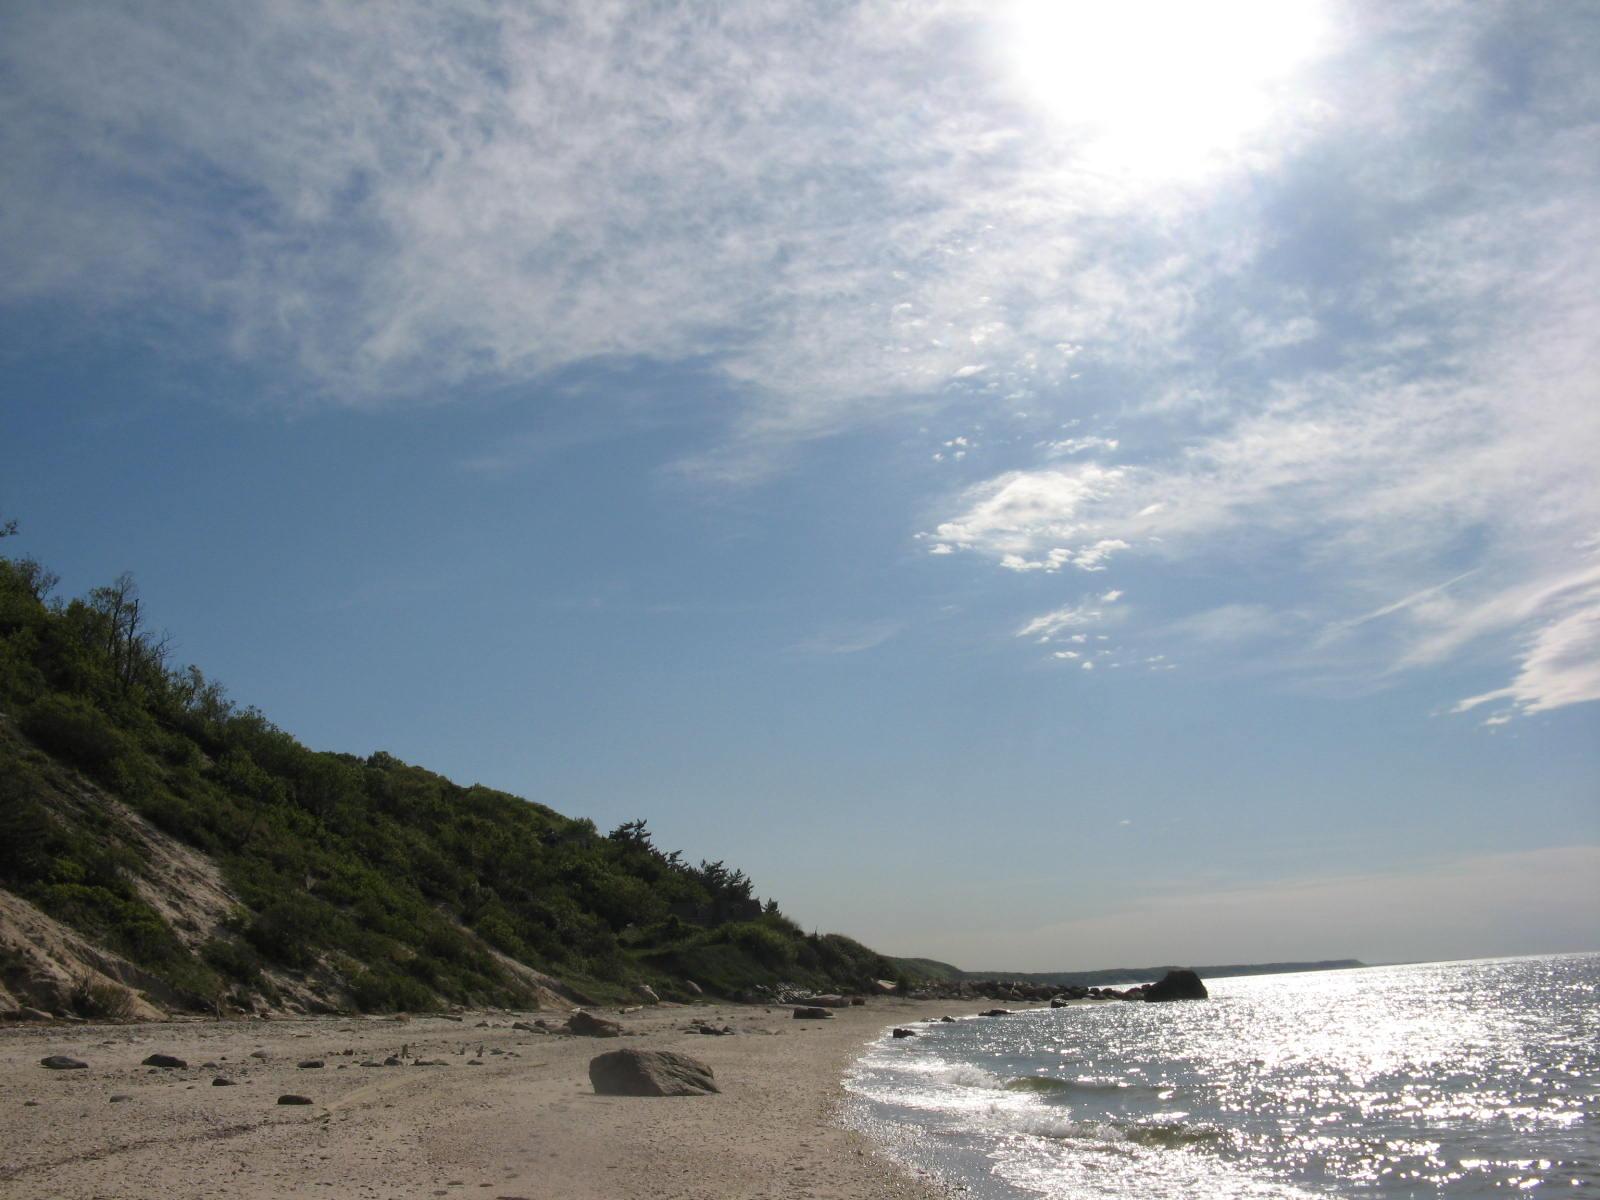 beach4may7_10.jpg